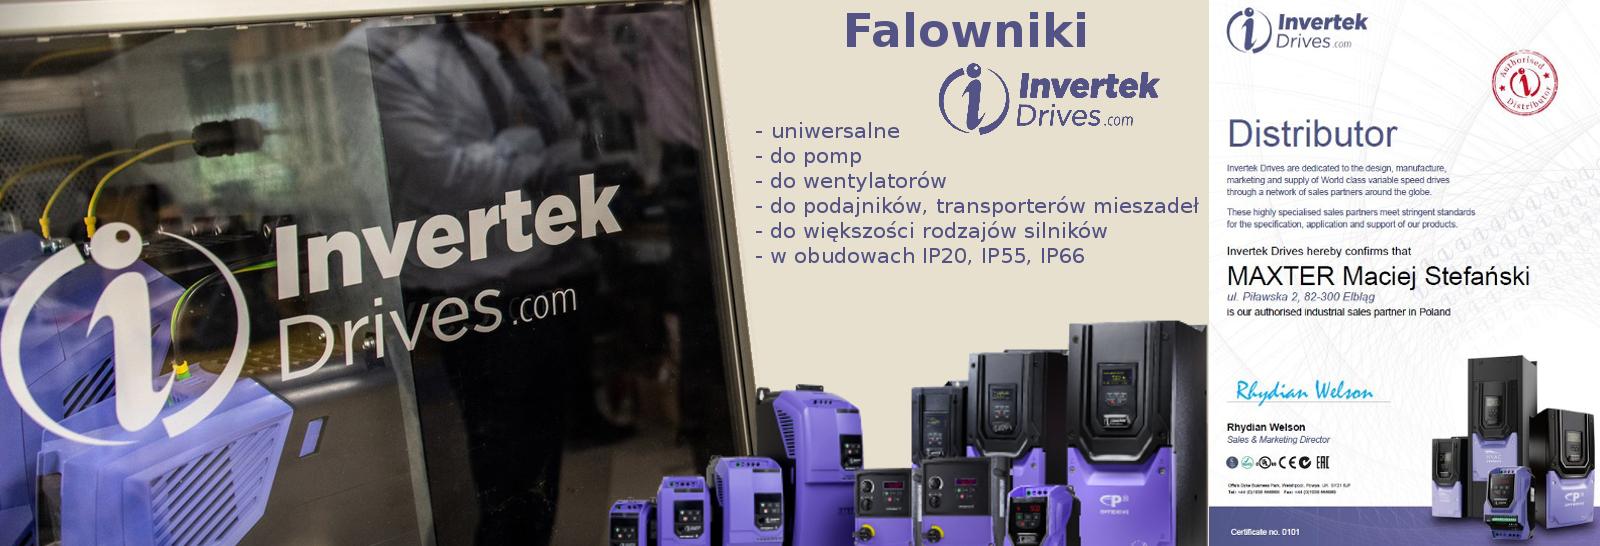 Falownik INVERTEK DRIVES